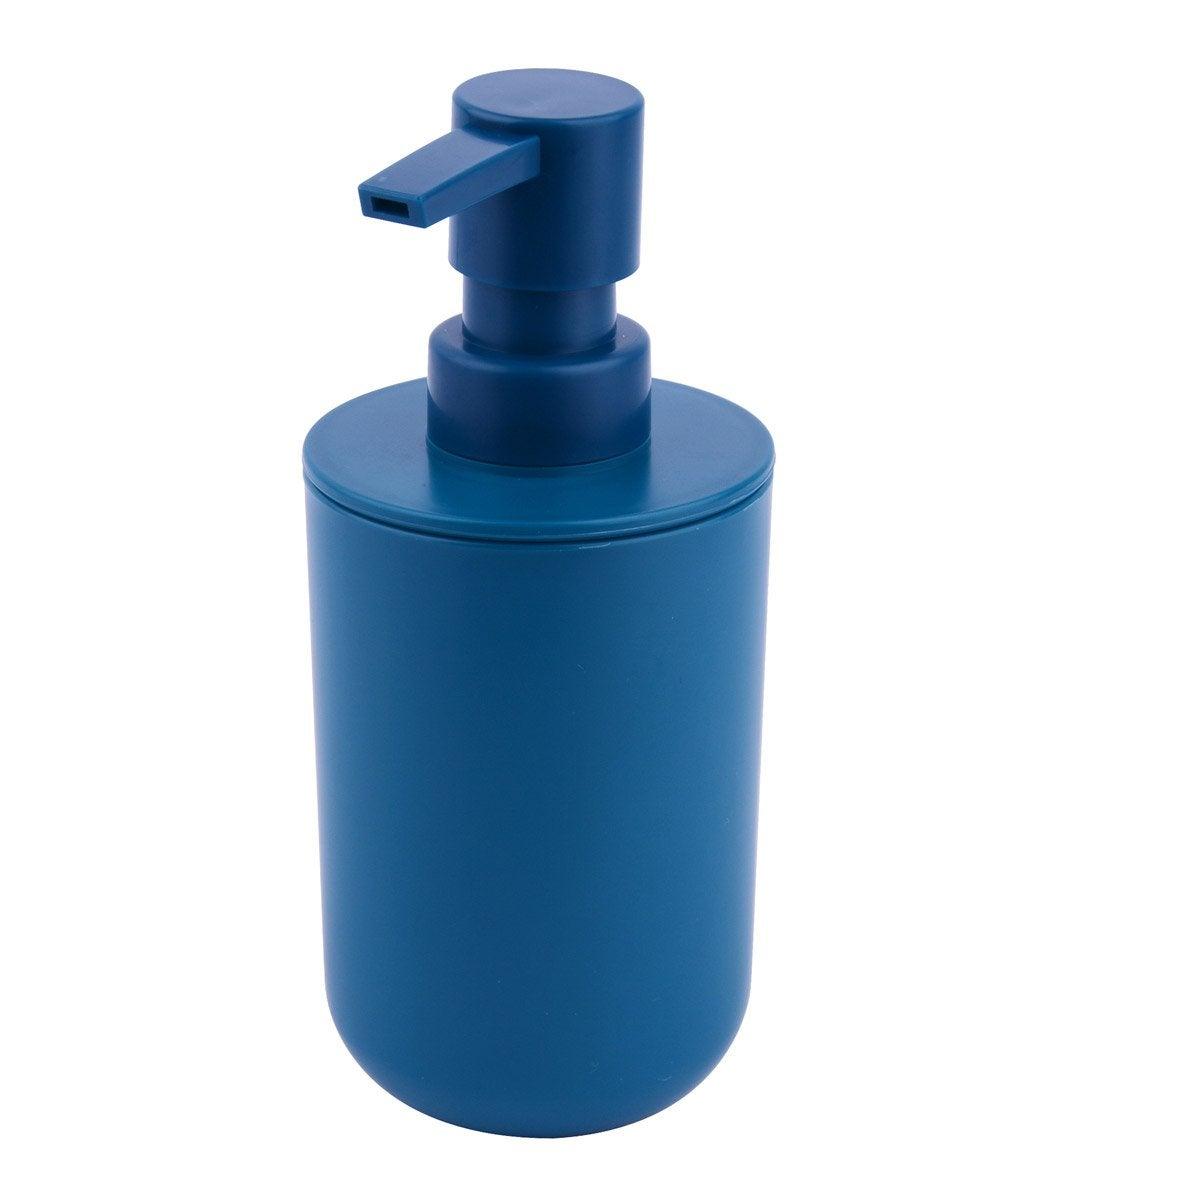 Distributeur de savon plastique Easy, miami n°1